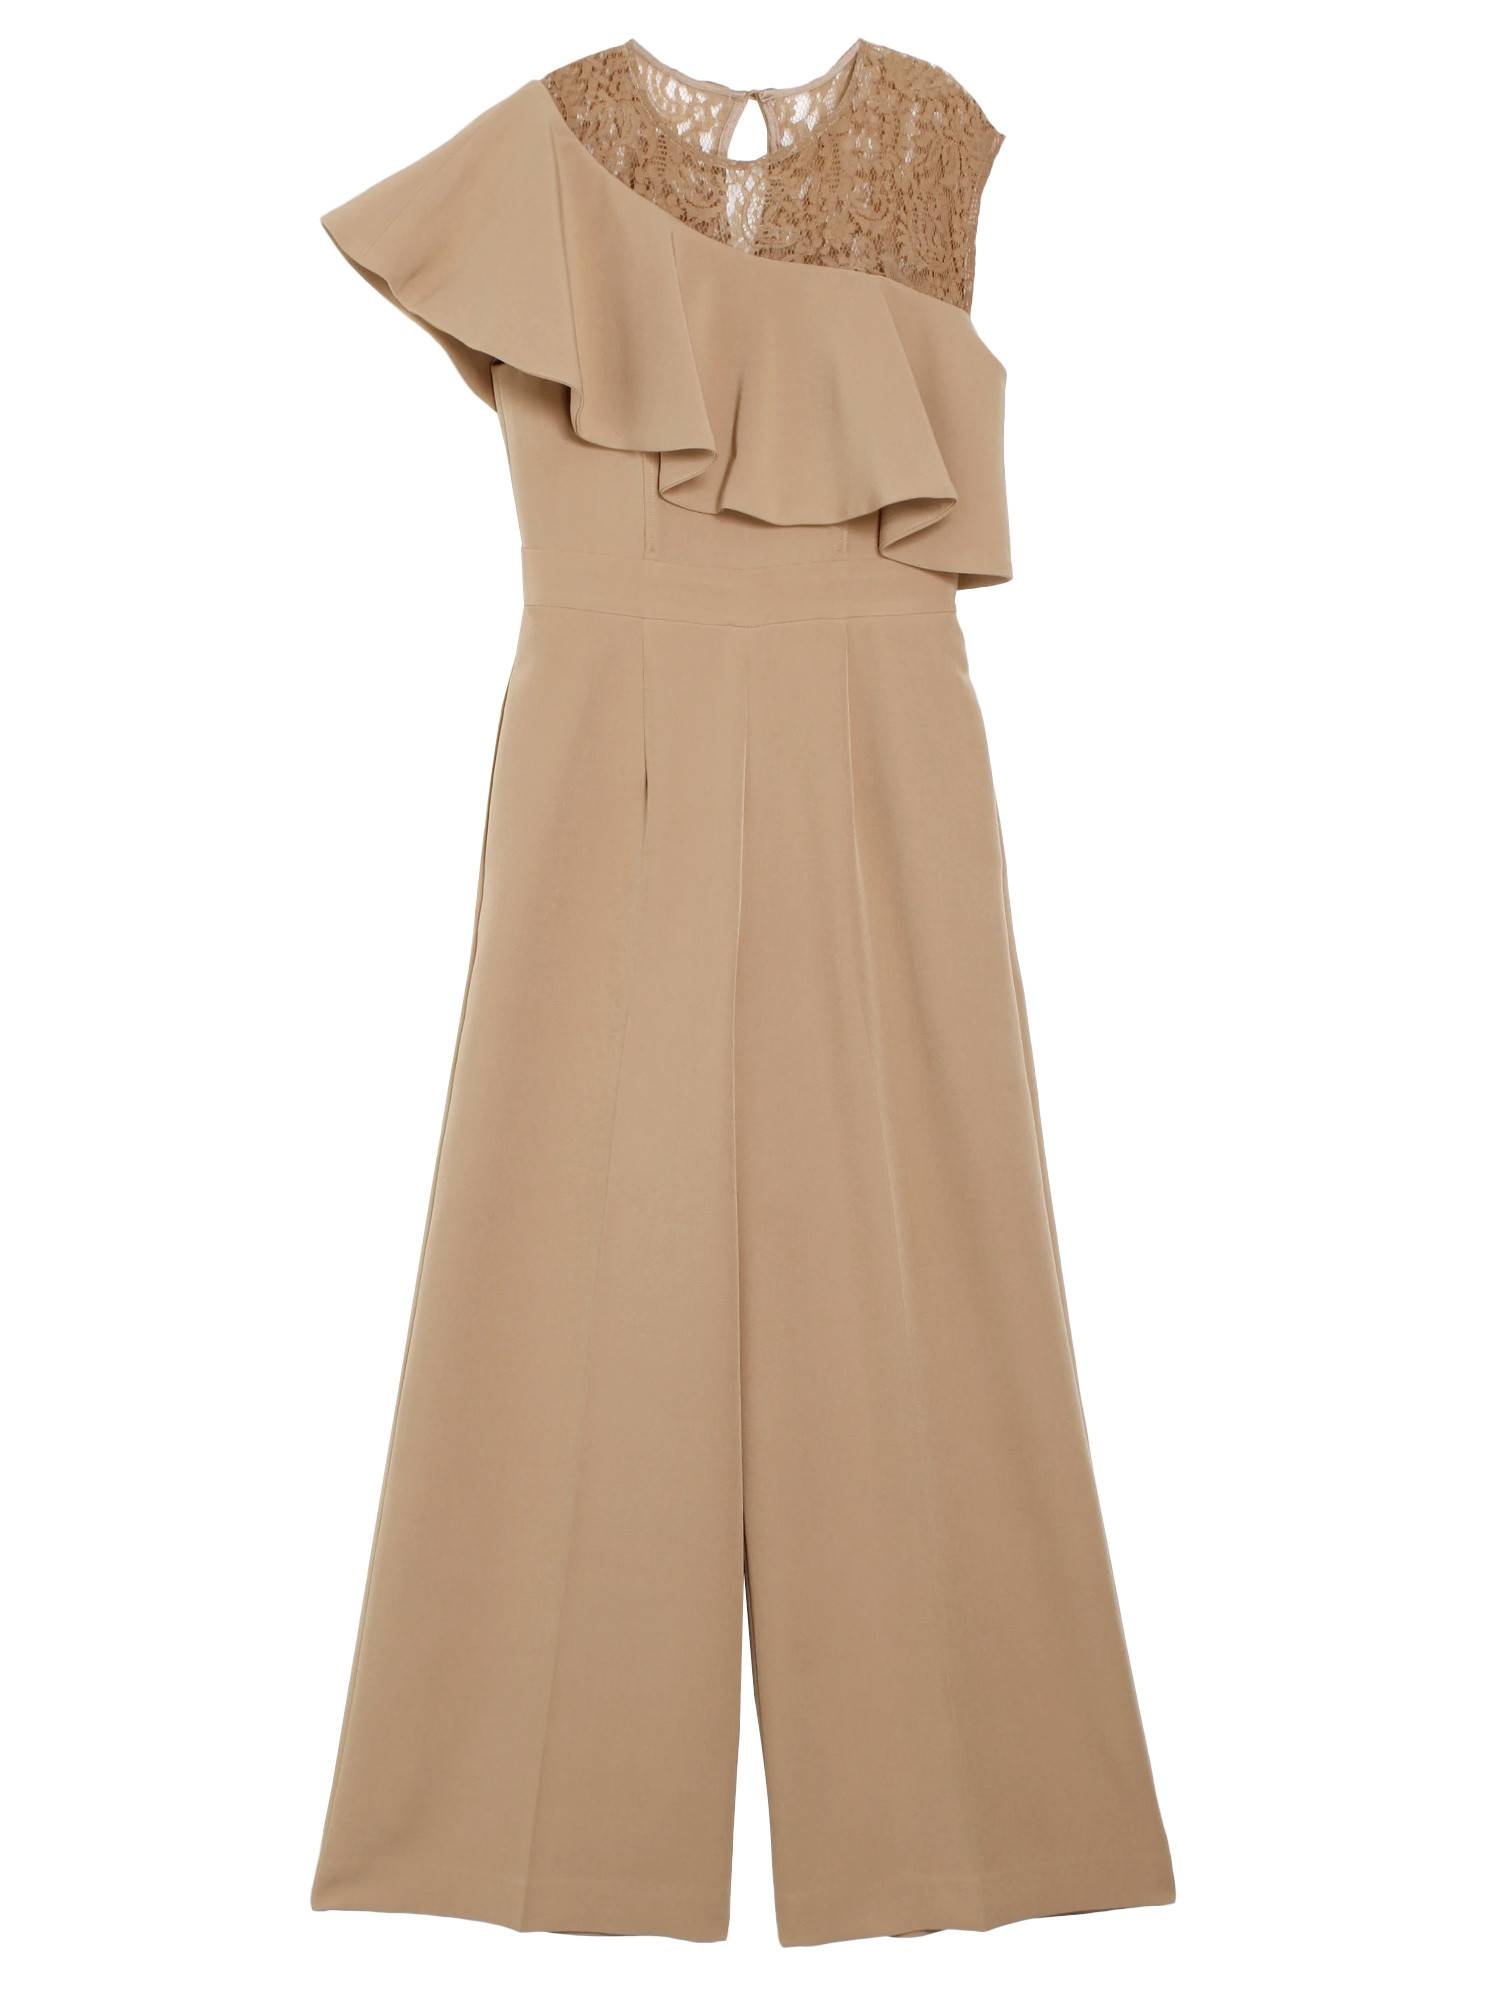 LADY ラッフルワイドパンツドレス